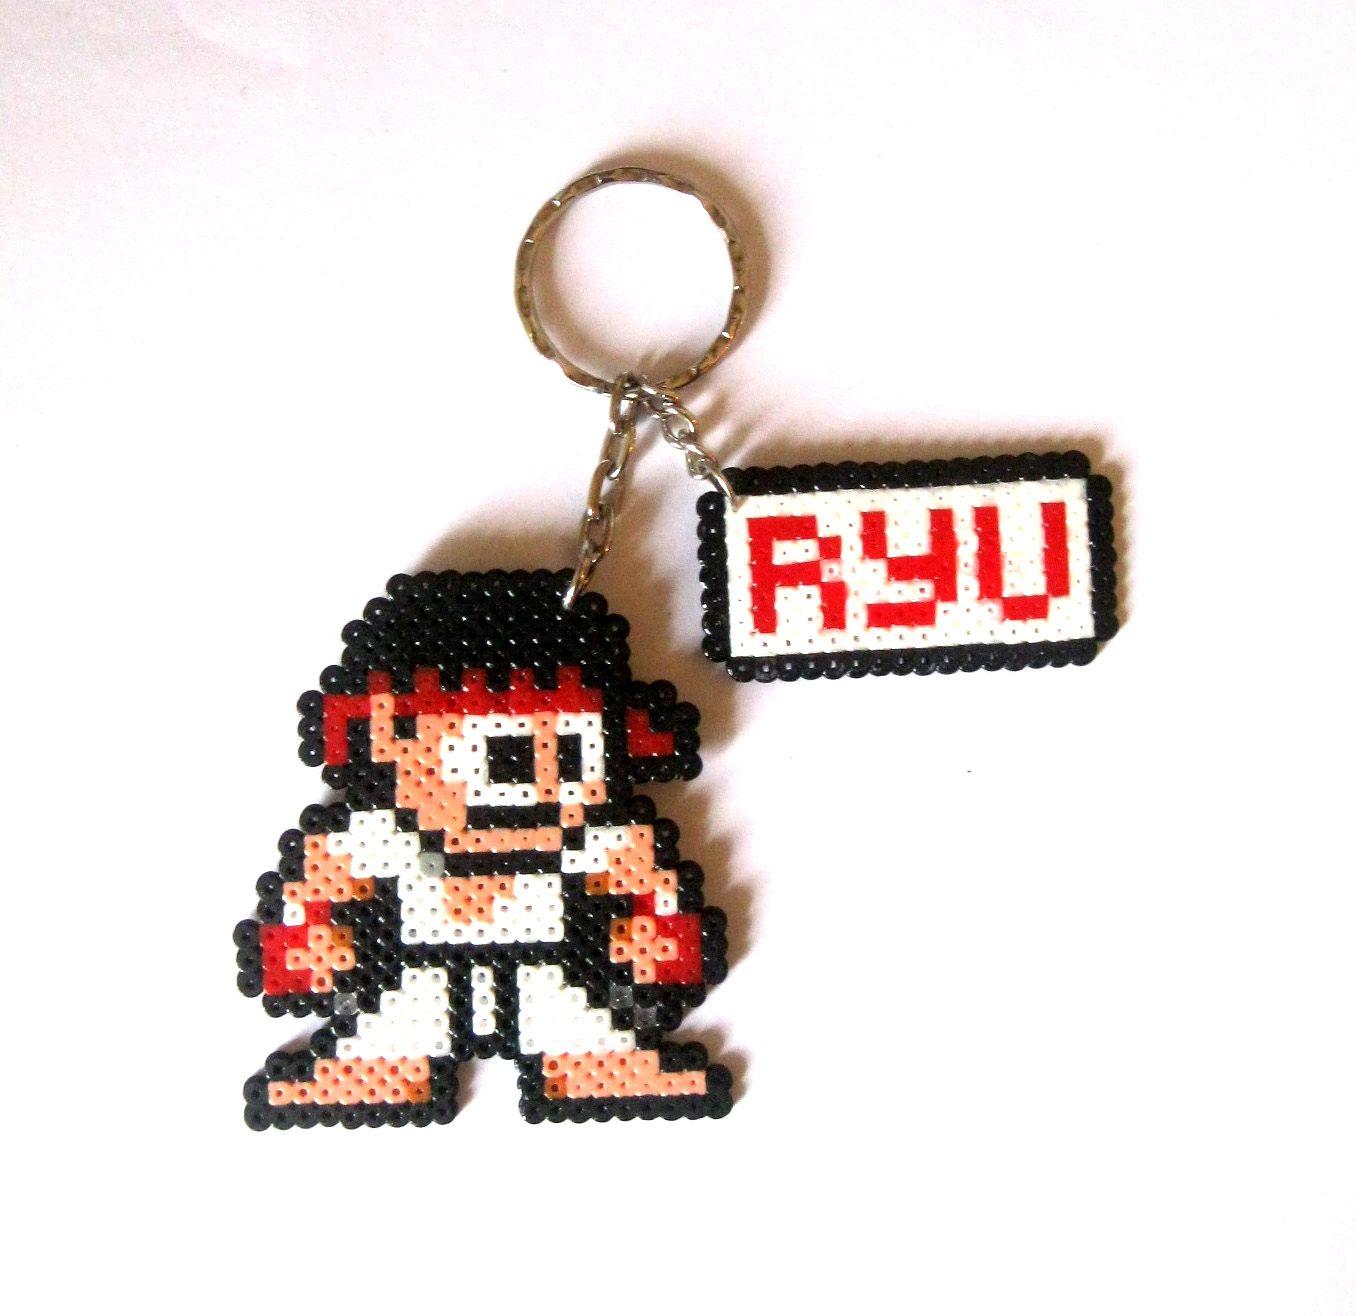 Ryu Street Fighter Sprite Keychain Hama Mini Beads By